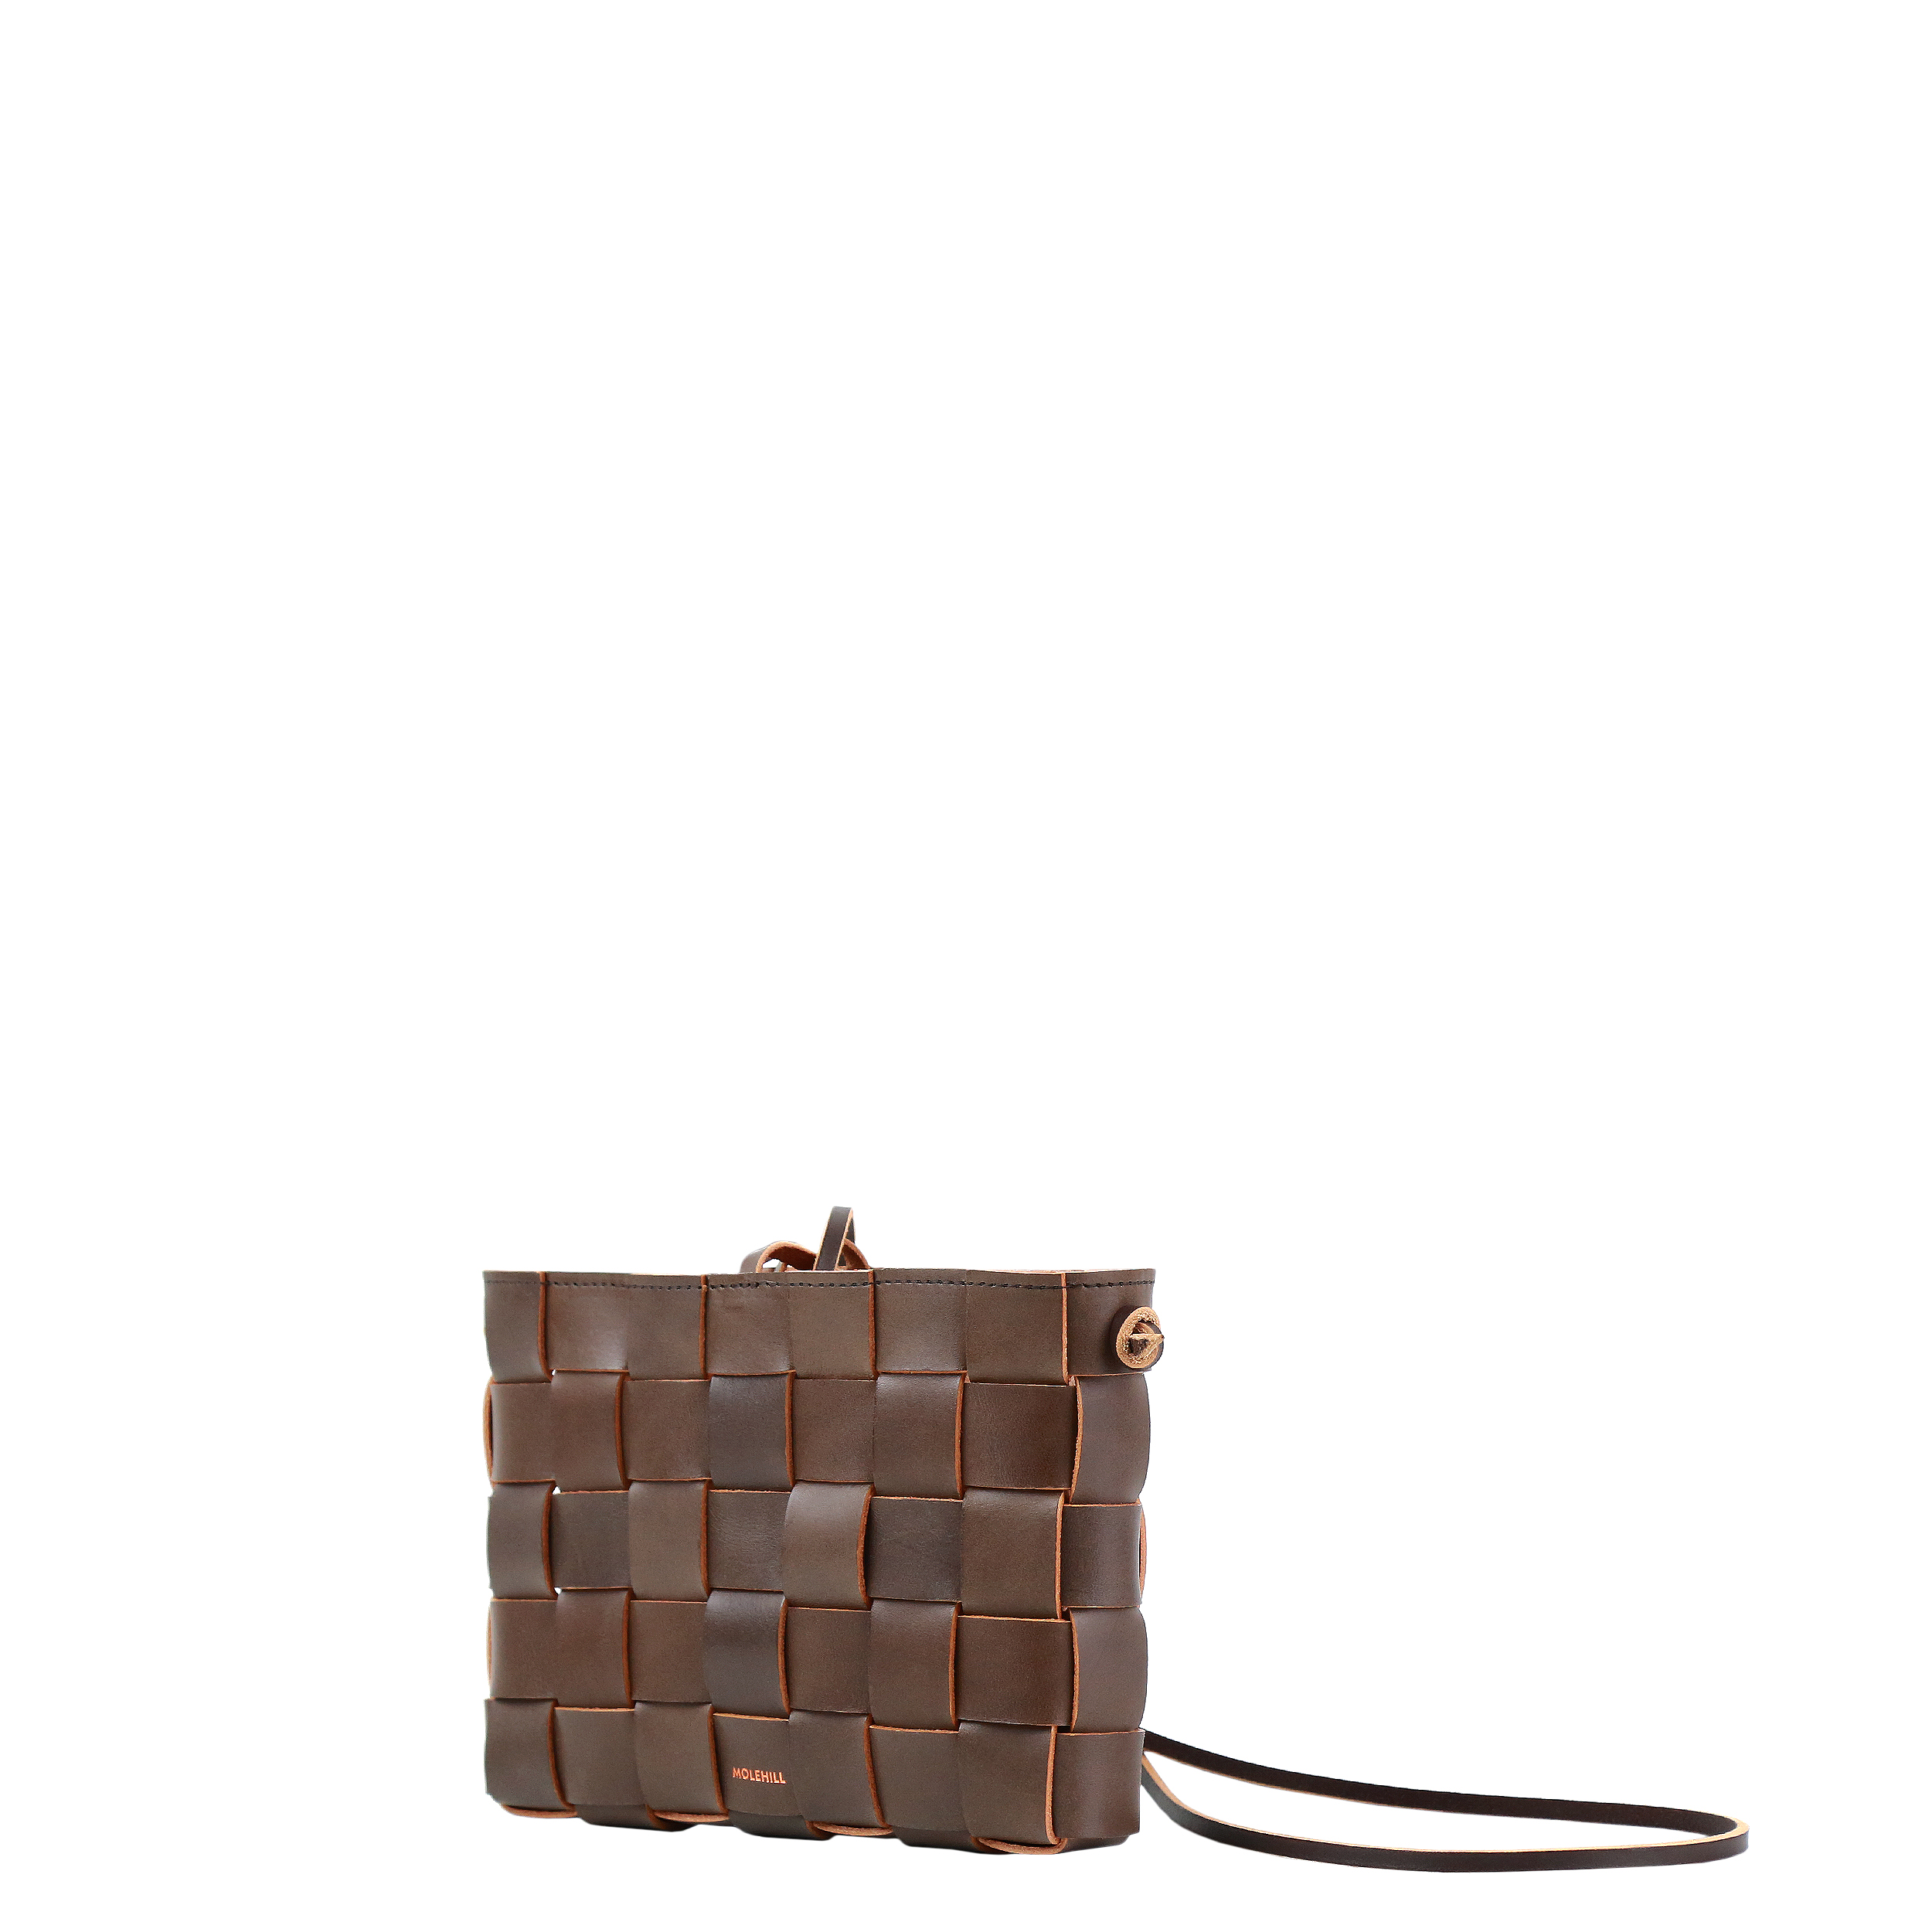 Pane Crossbody Woven Bag Light Chocolate-1